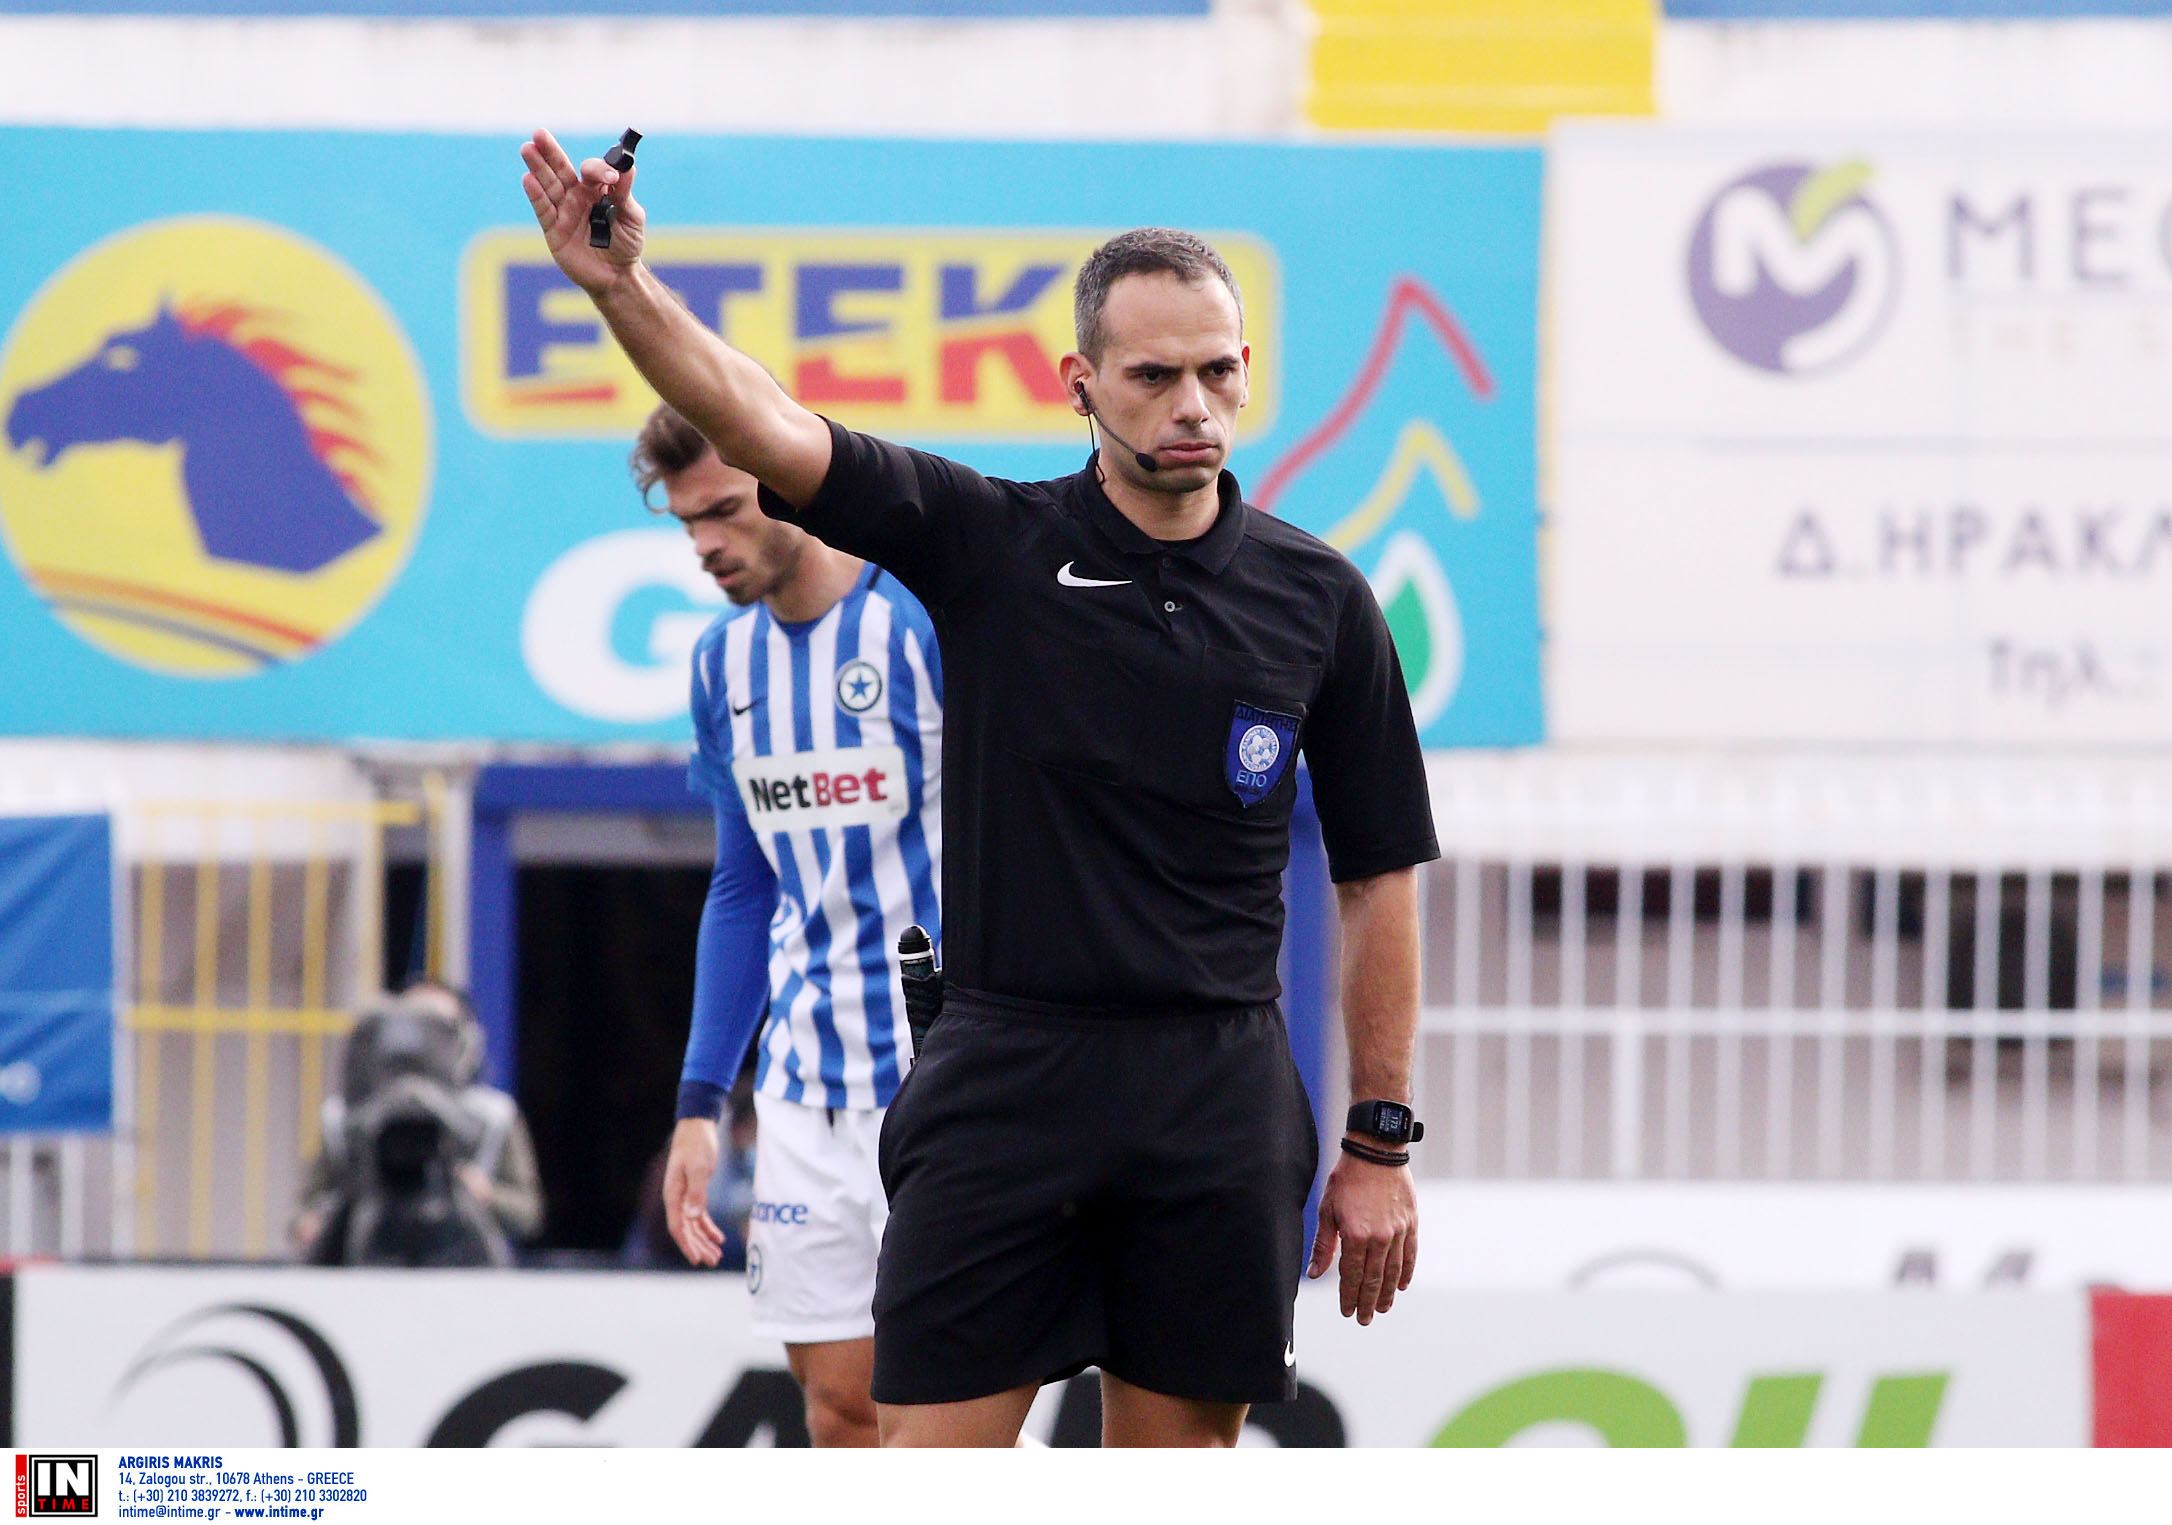 Superleague: Εκτός ορισμών οι Παπαπέτρου και Τσαγκαράκης